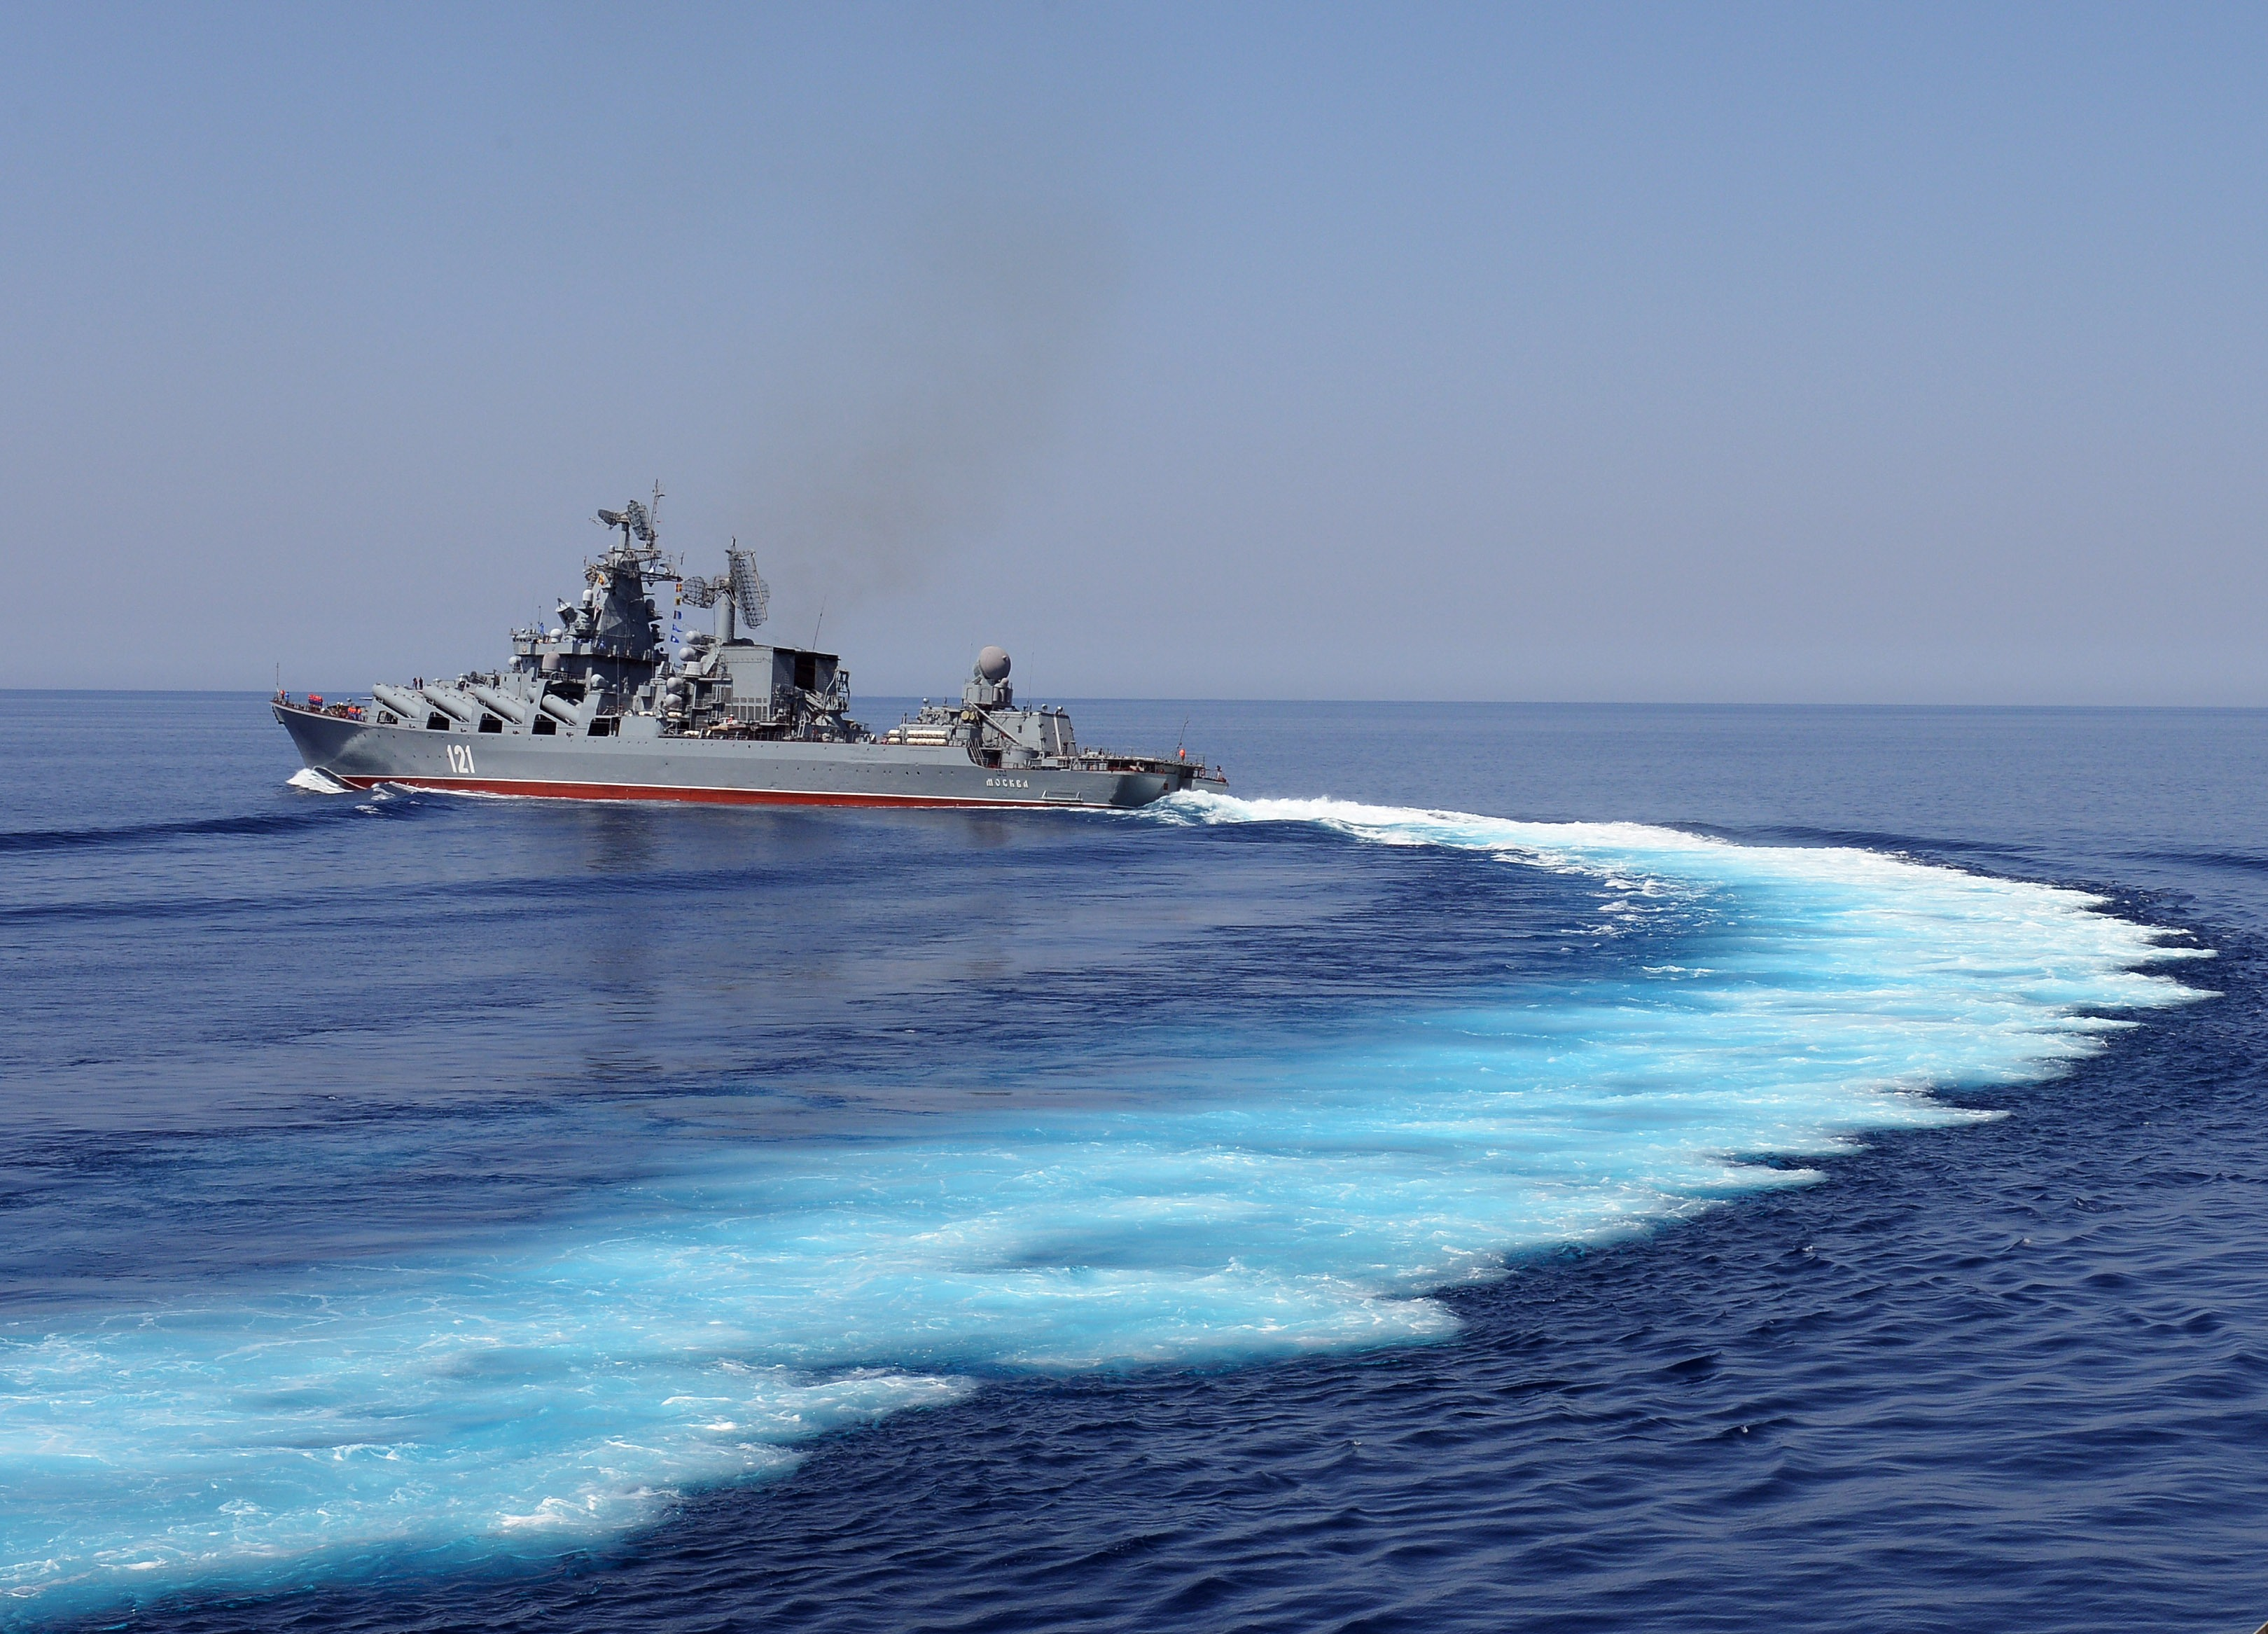 Project 1164 Atlant: Slava Class cruiser - Page 5 23-4218298-szm-2015